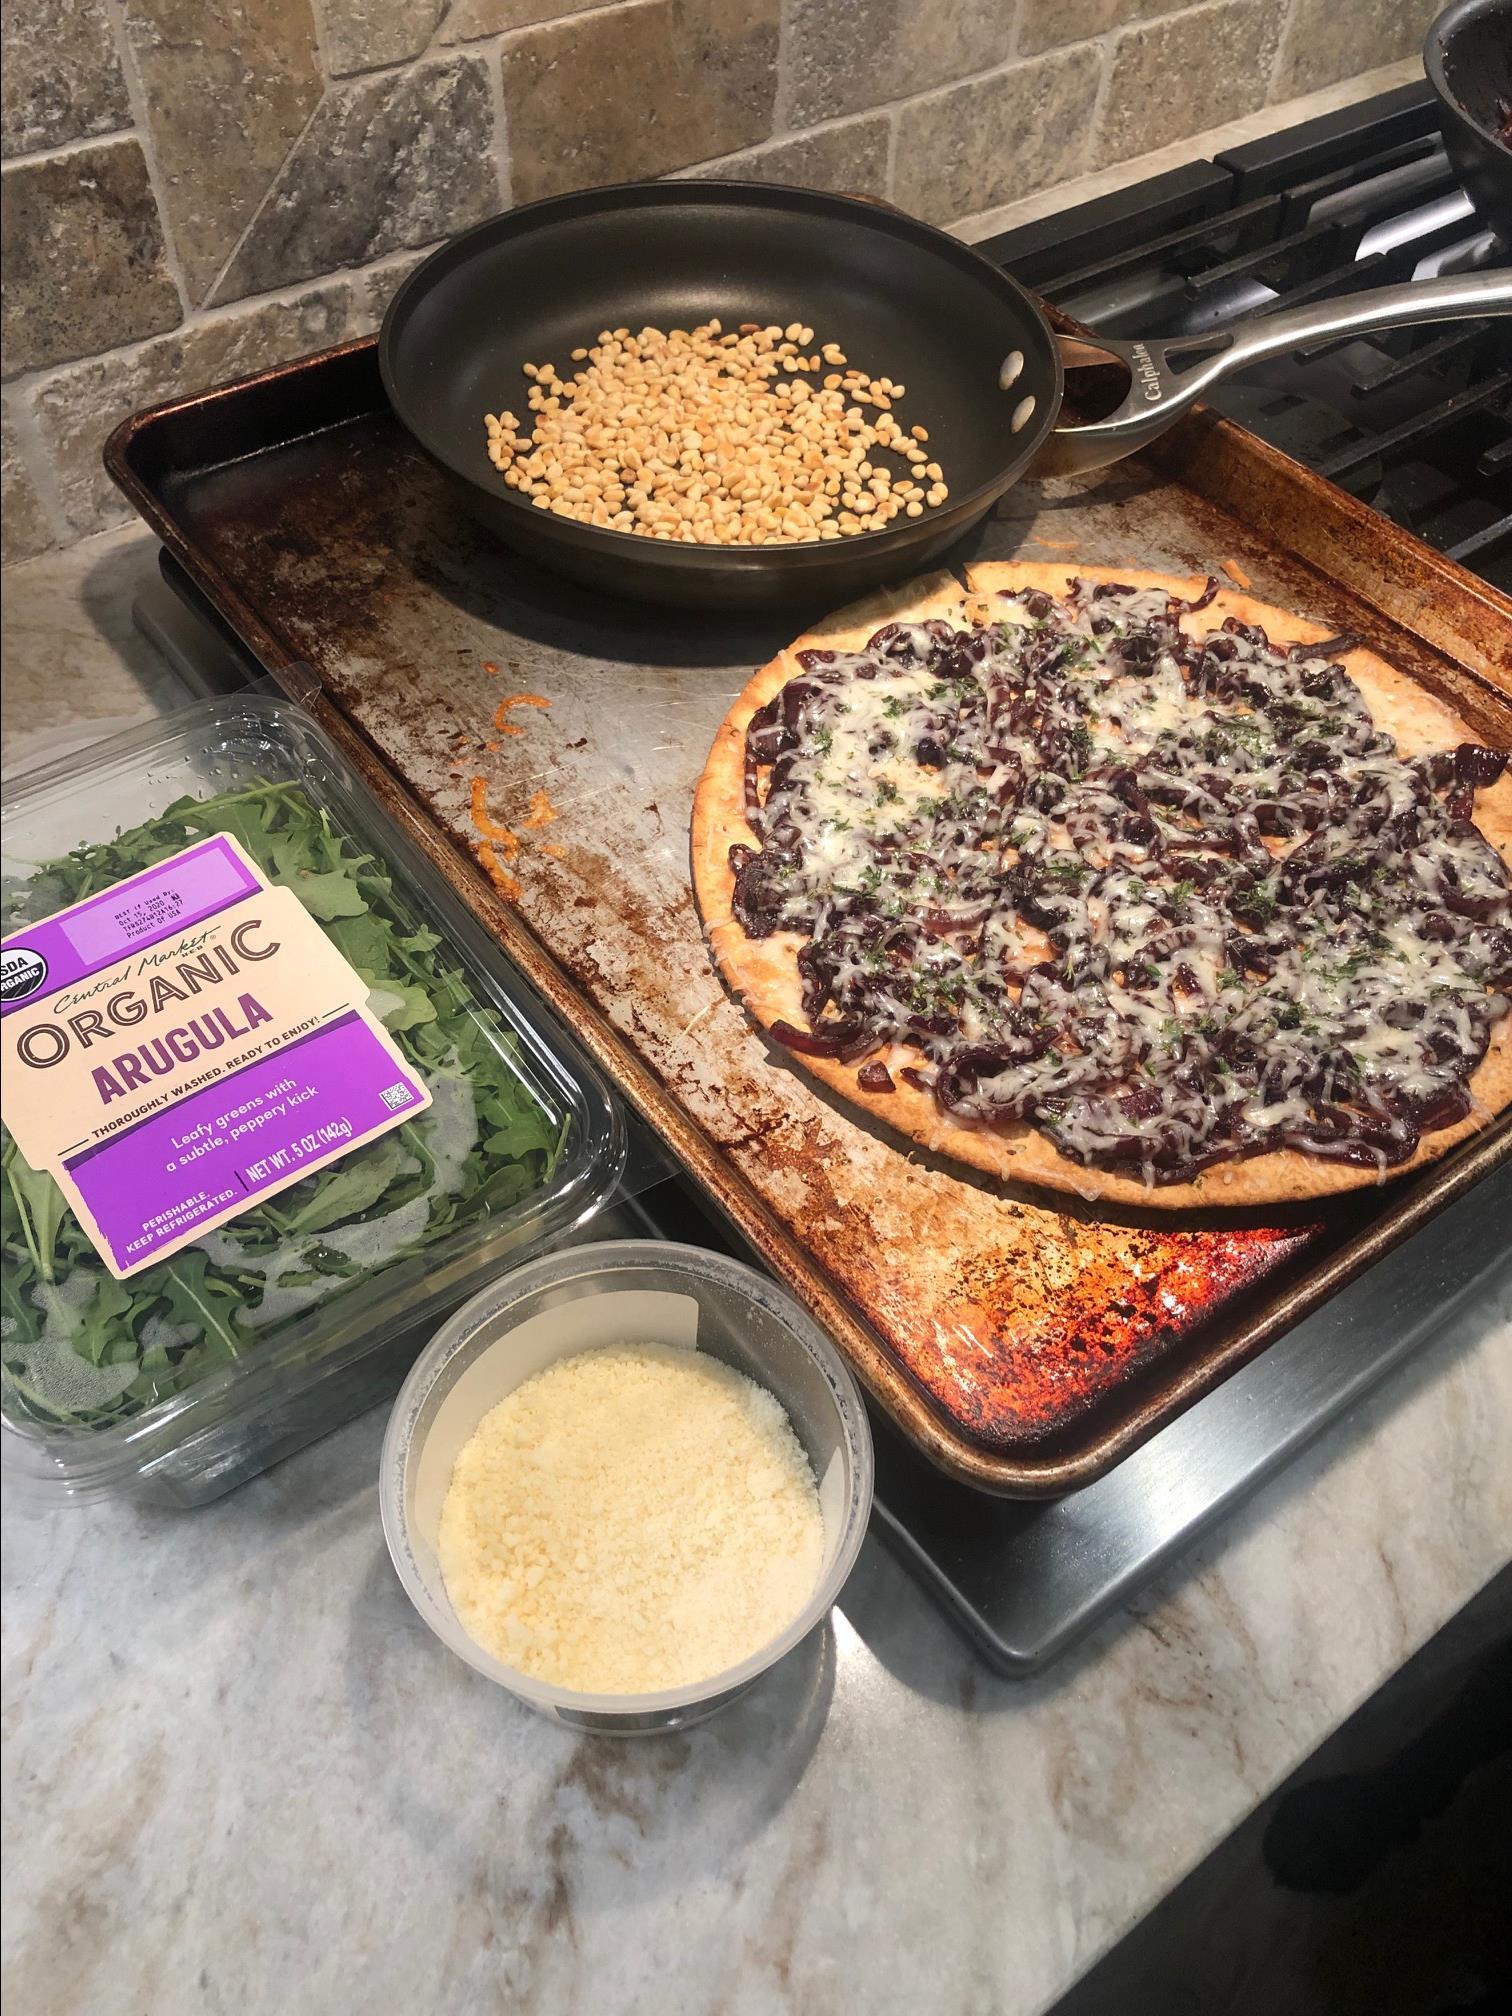 Caramelized Onion and Arugula Pizza